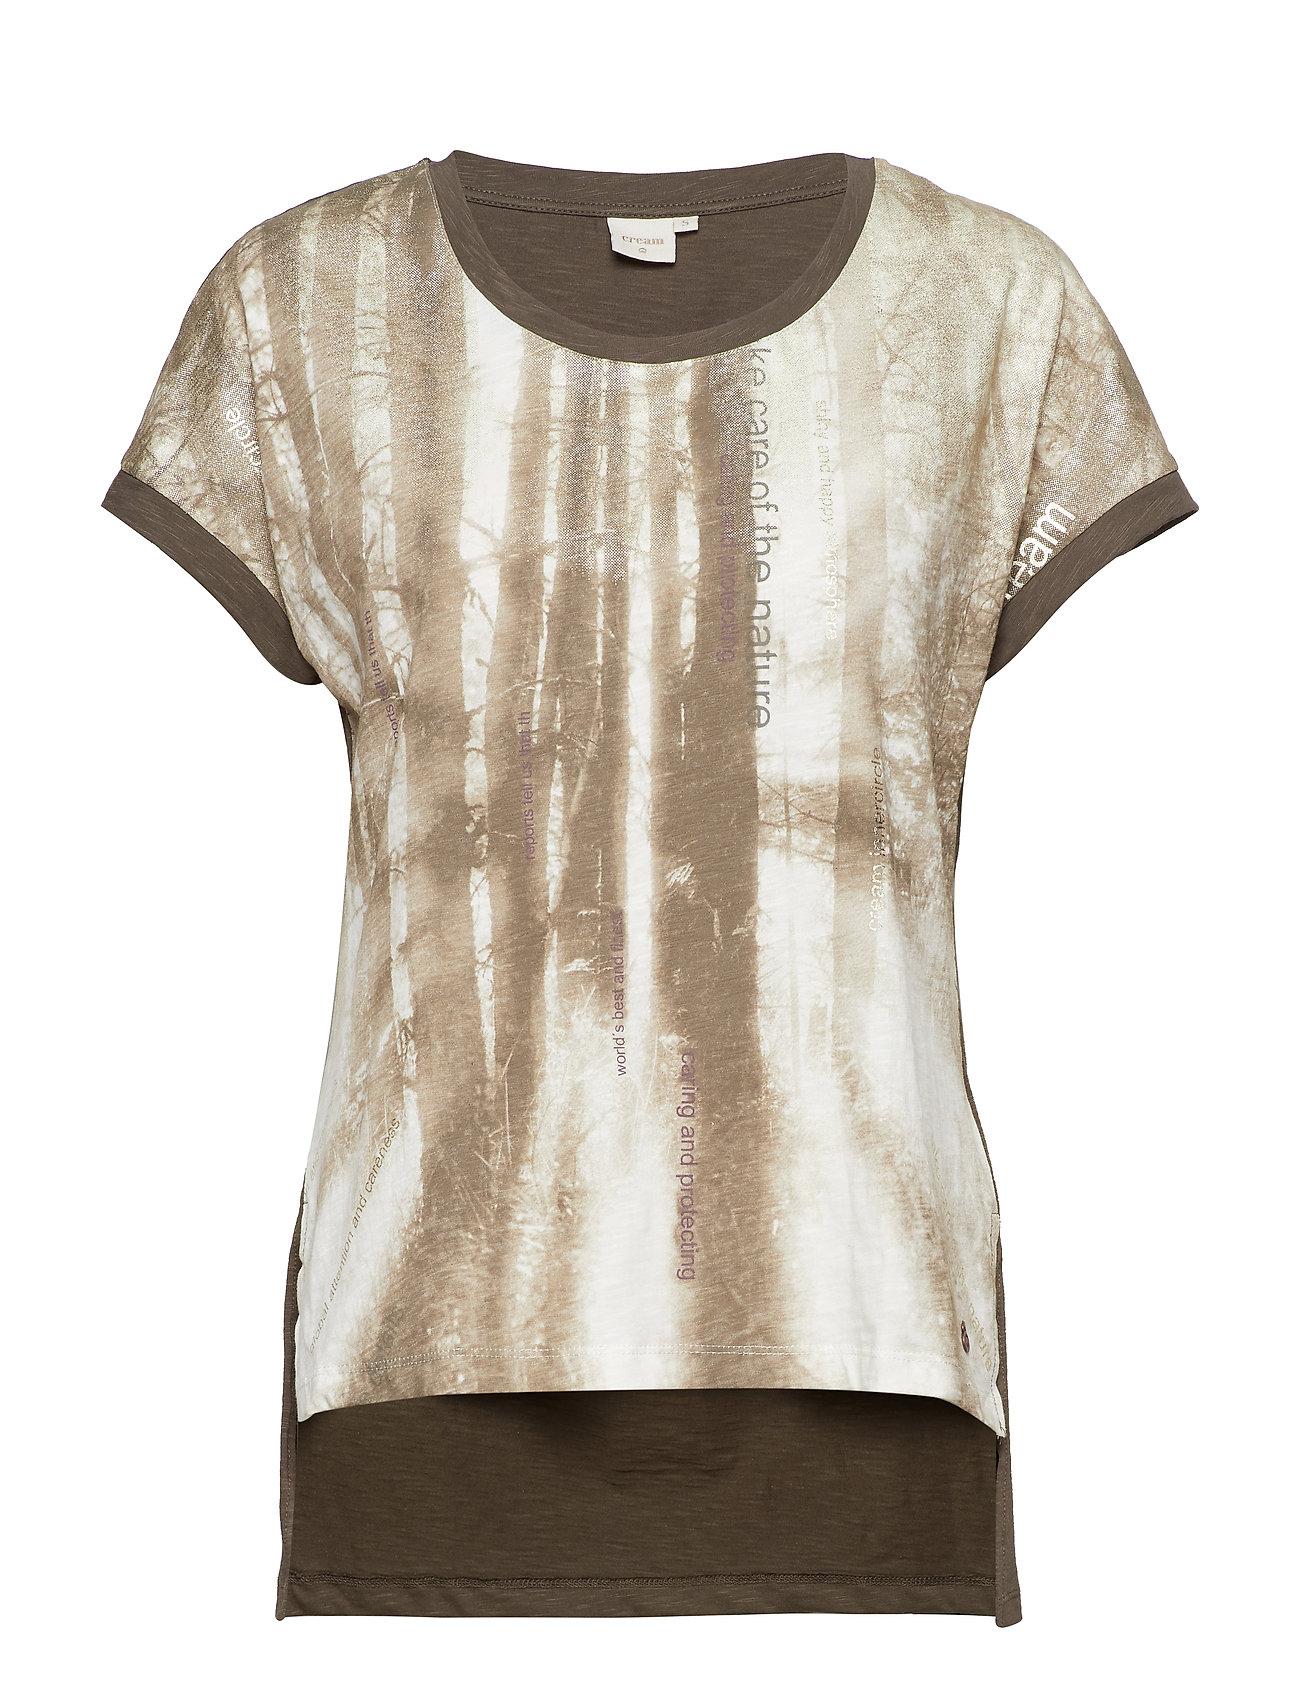 Cream Lavenie Tshirt - MAJOR BROWN